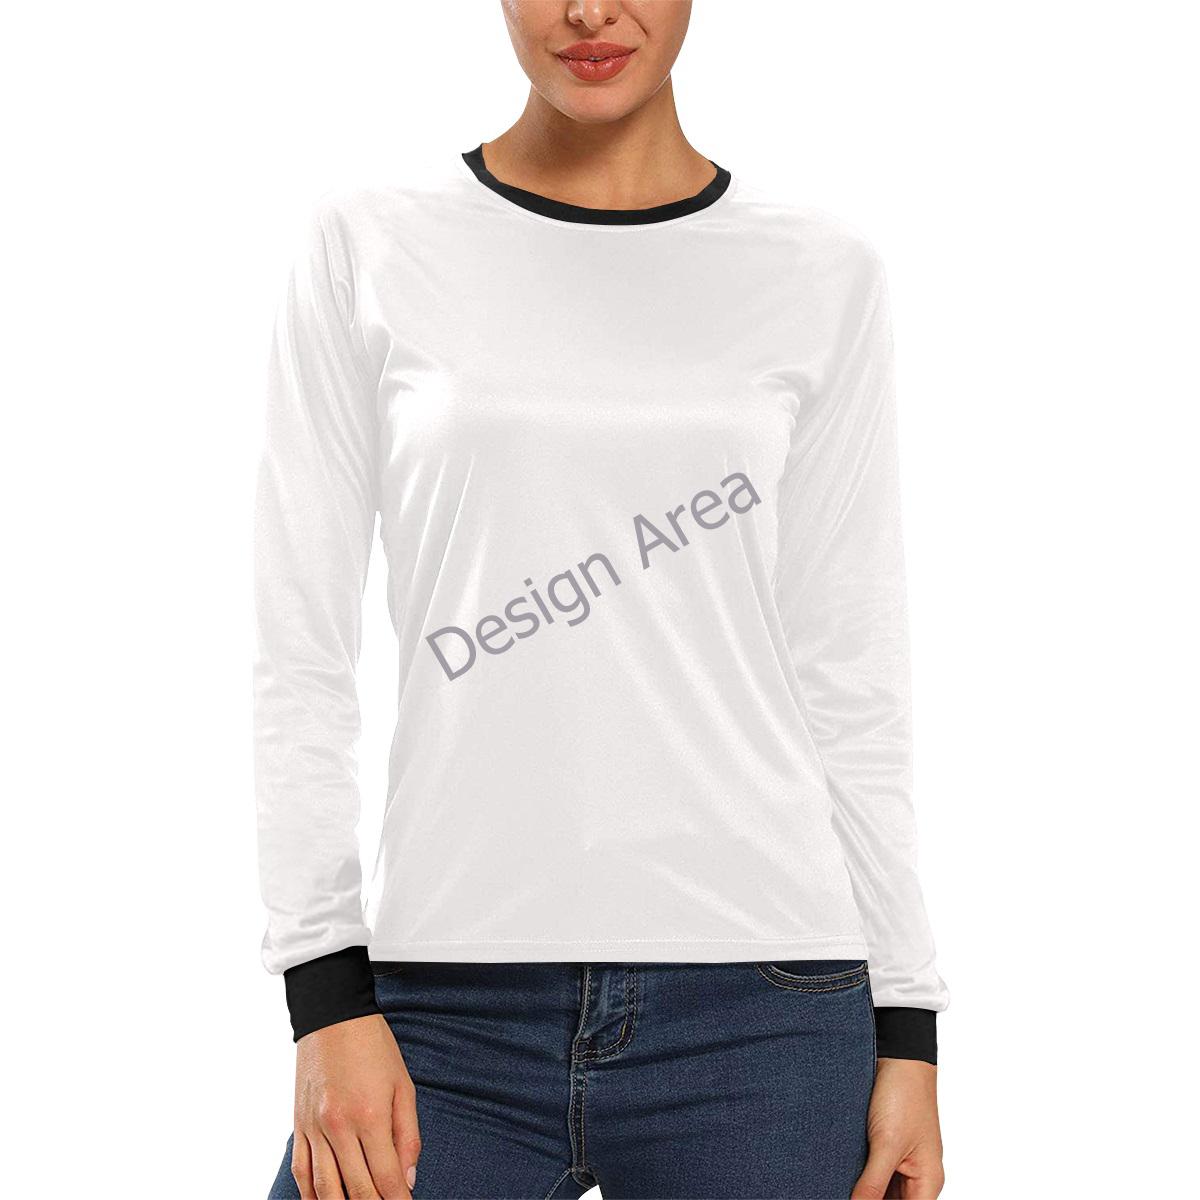 Women's All Over Print Long Sleeve T-shirt (Model T51)